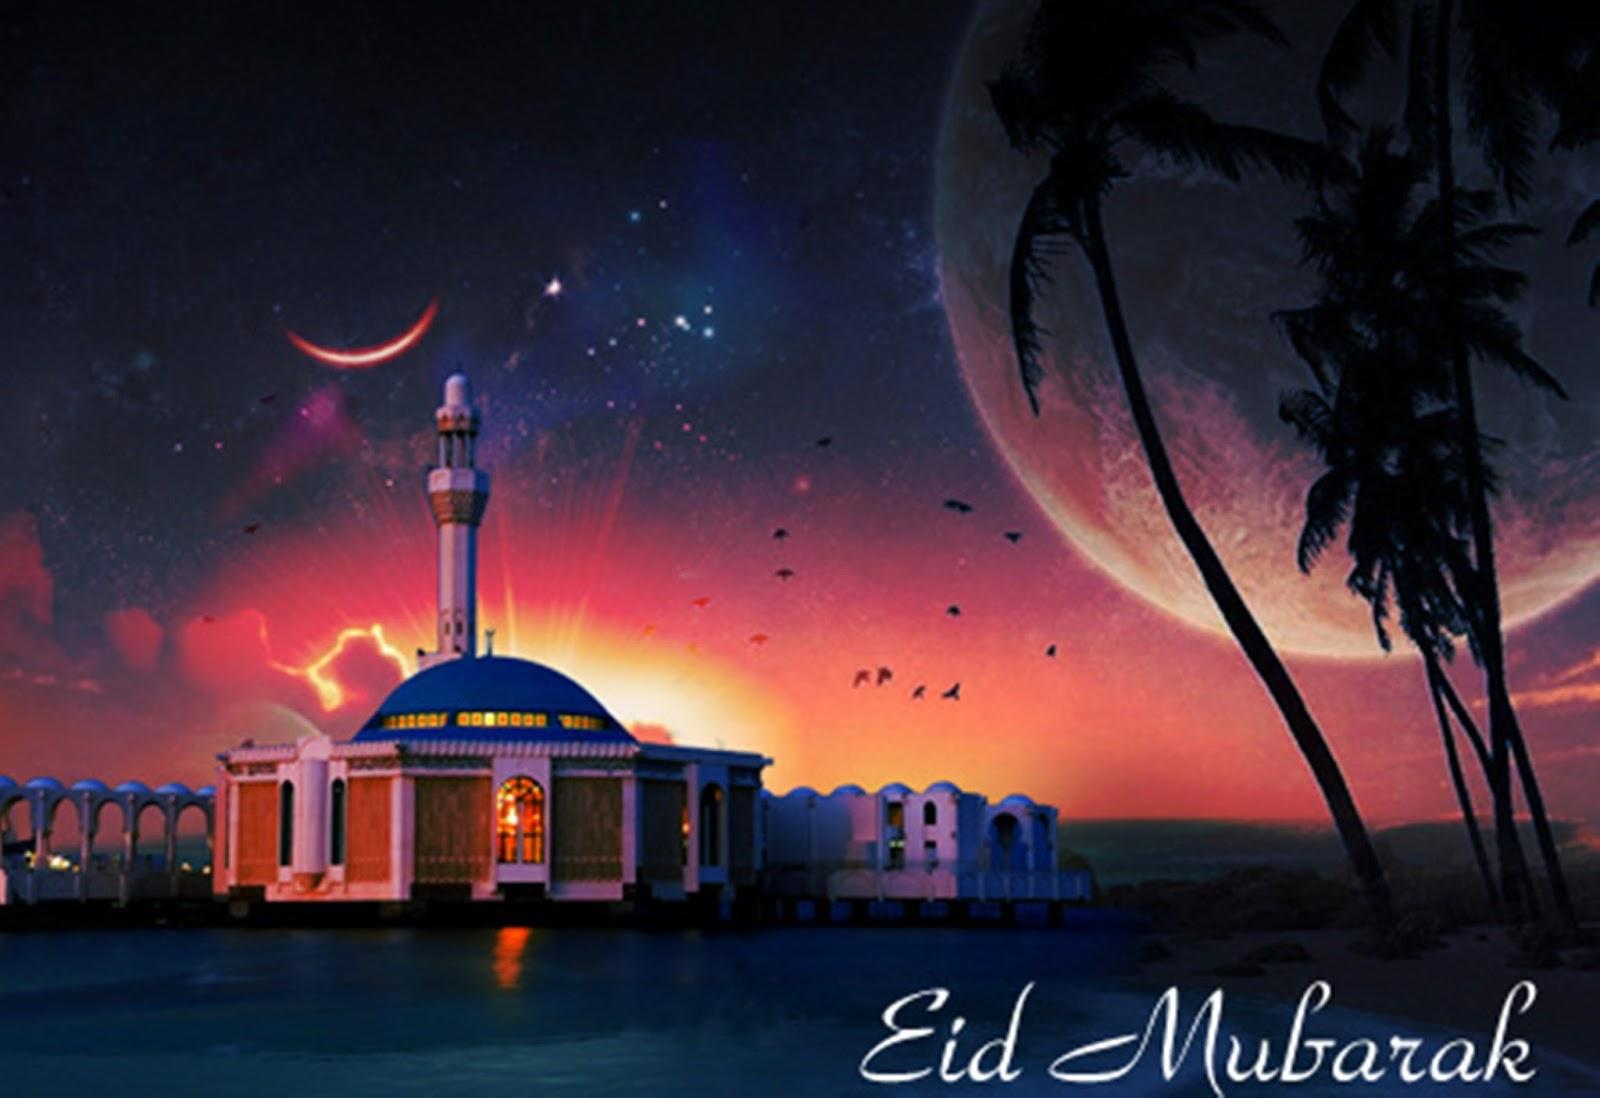 Most Inspiring Facebook Cover 2016 Ied Wallpaper - 006%2BHappy-Eid-Mubarak-Wallpapers-Best-Eid-Wishes-Eid  Trends_442634 .jpg